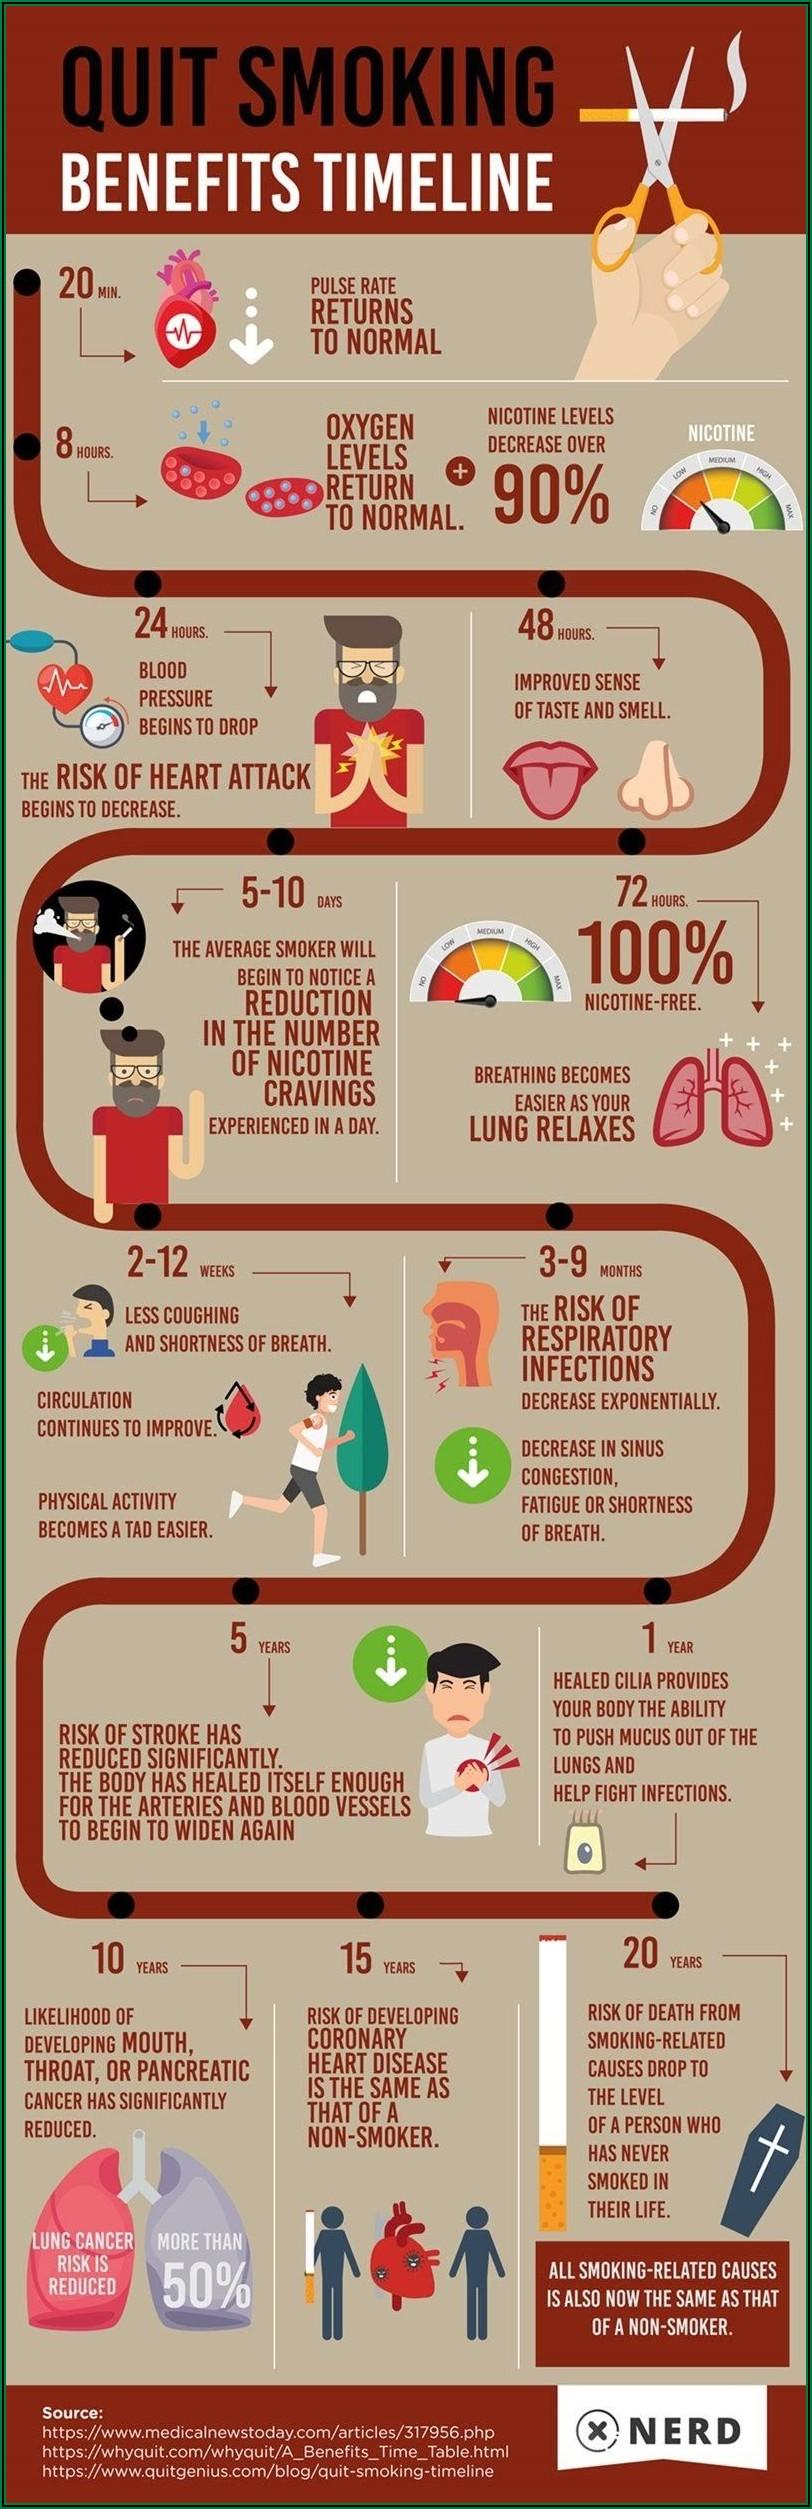 Smoking Cessation Health Benefits Timeline